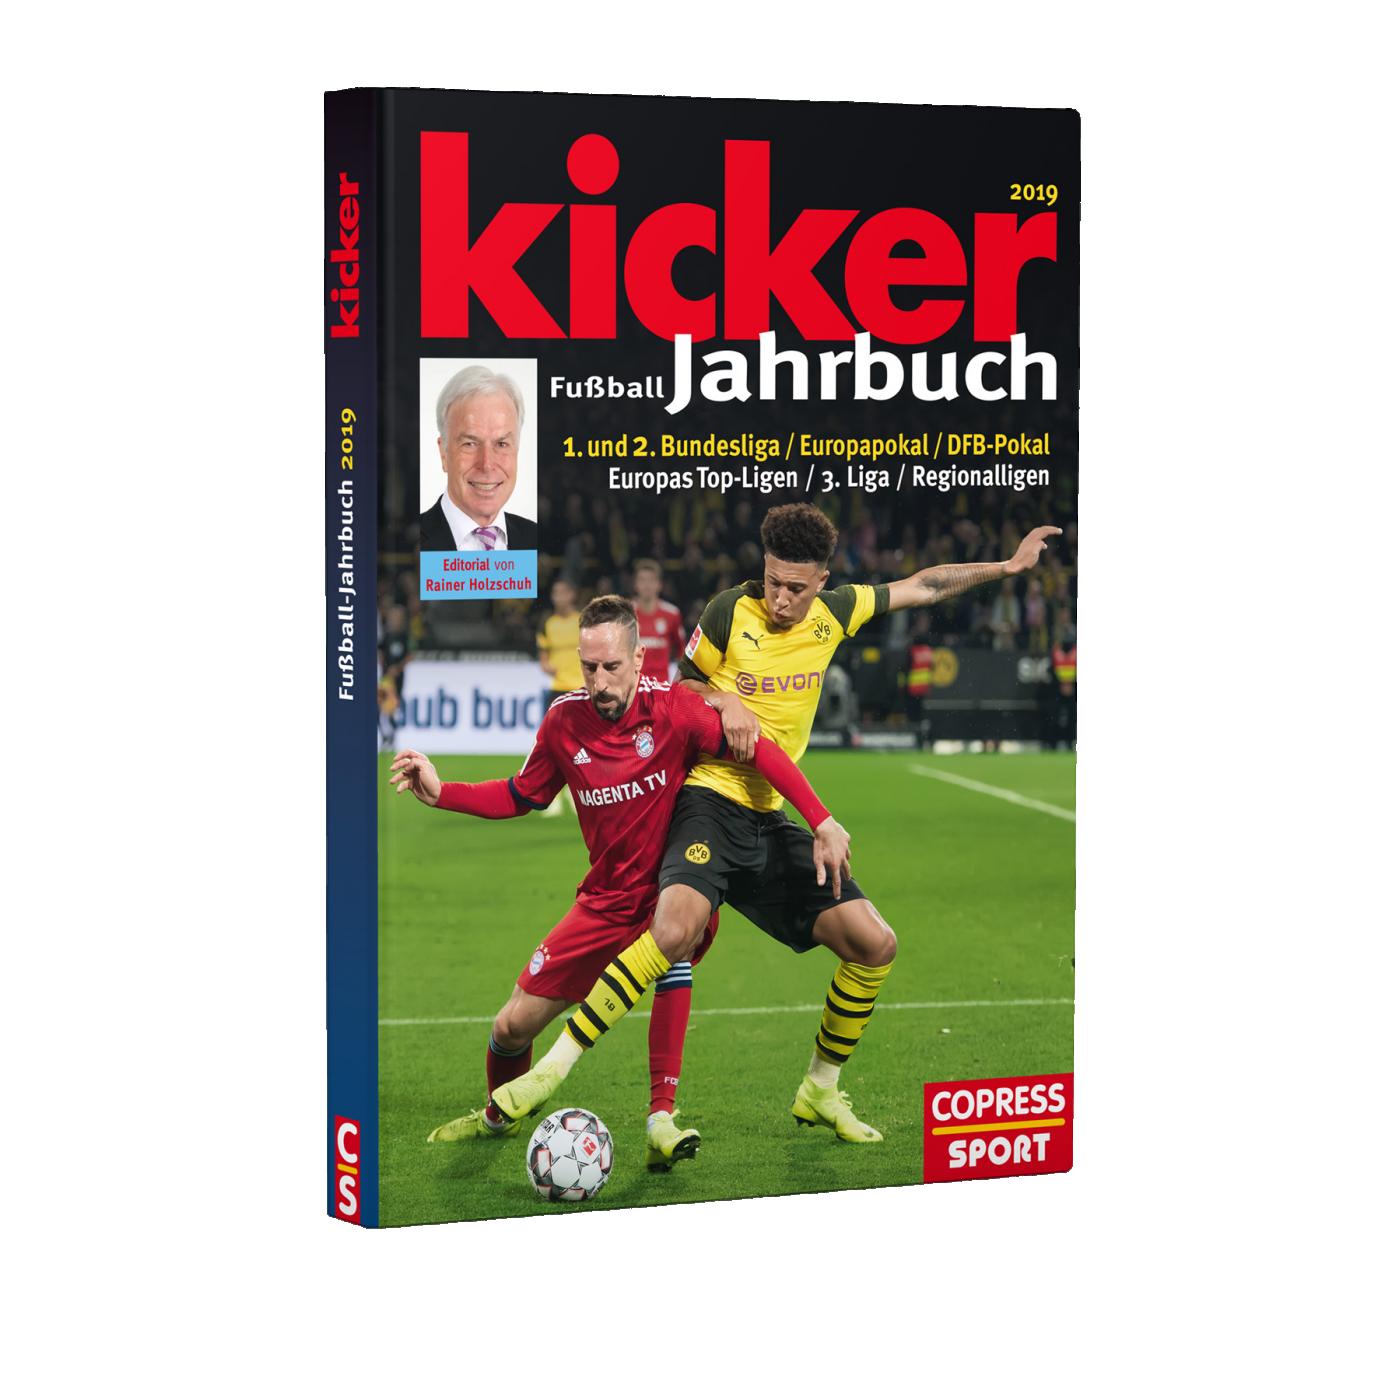 kicker Jahrbuch 2019 - rot